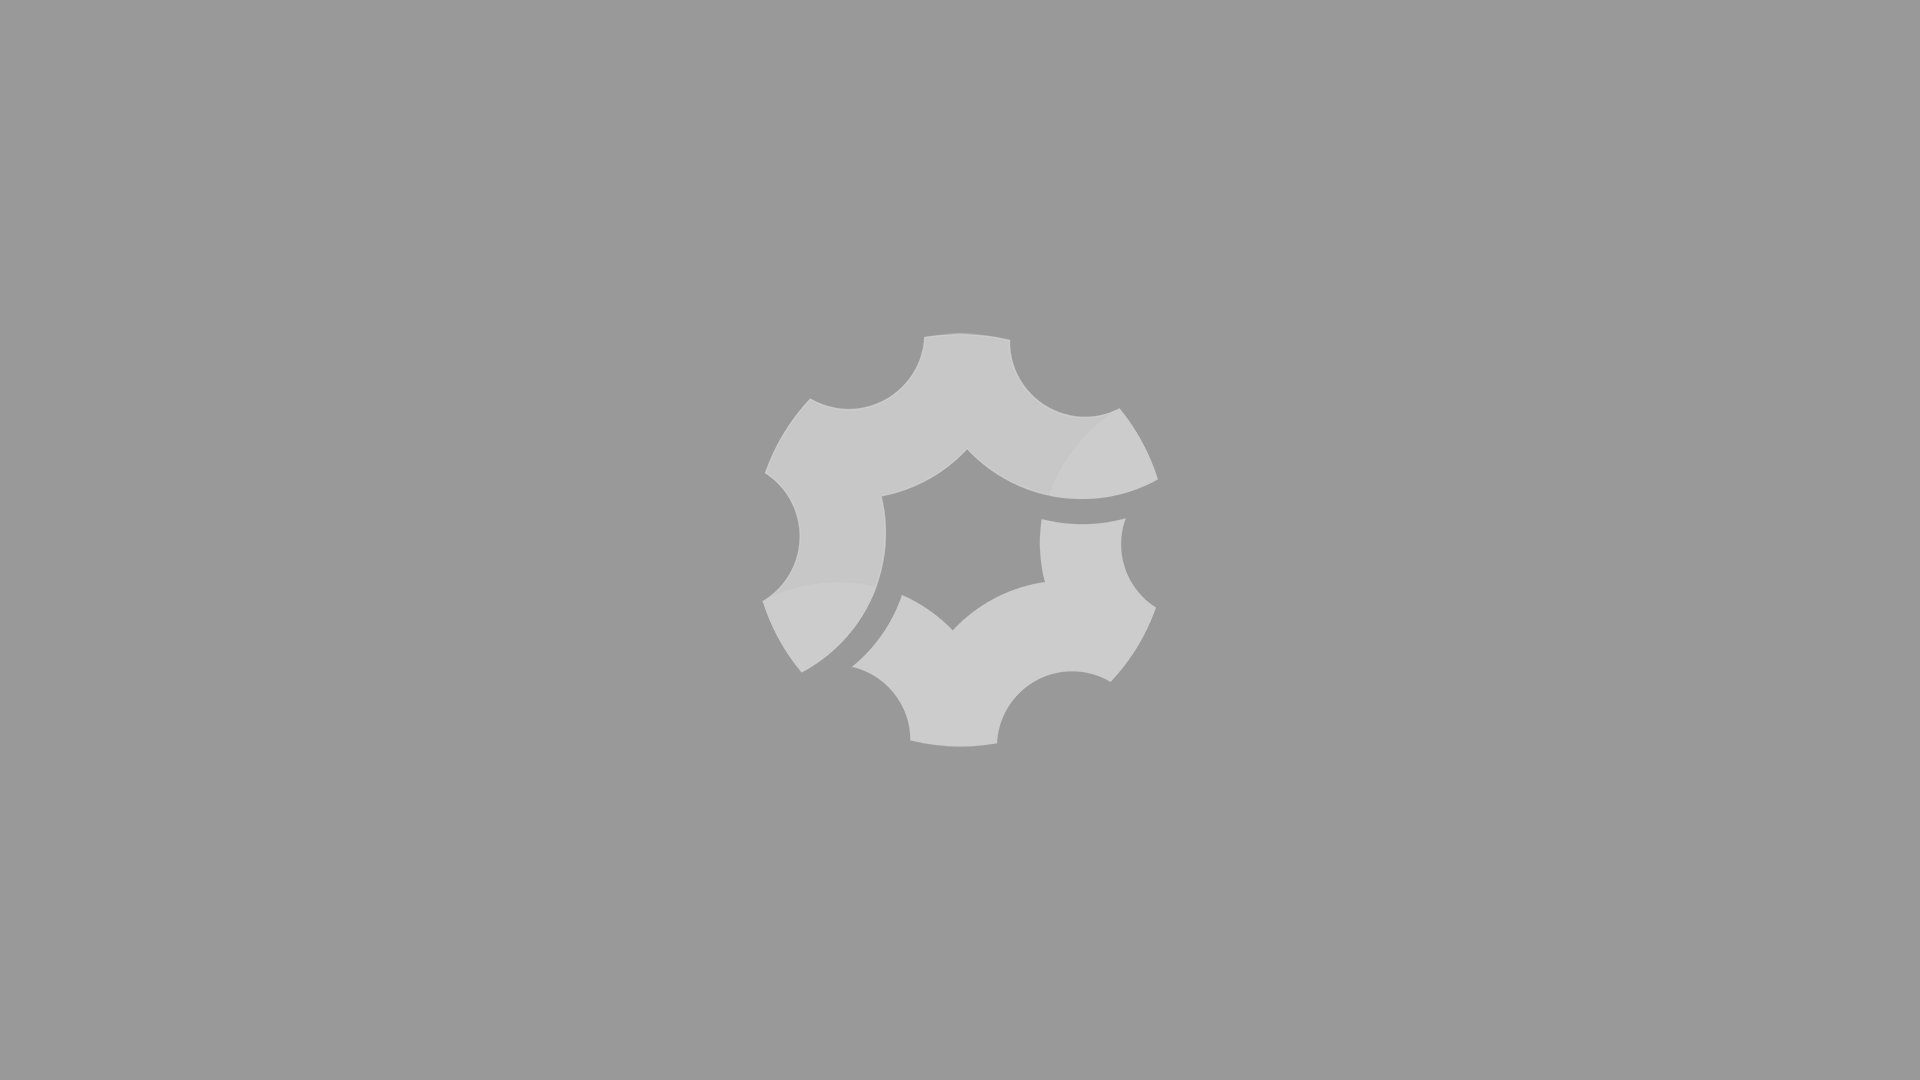 new_bitmap_image.bmp_thumbss.png